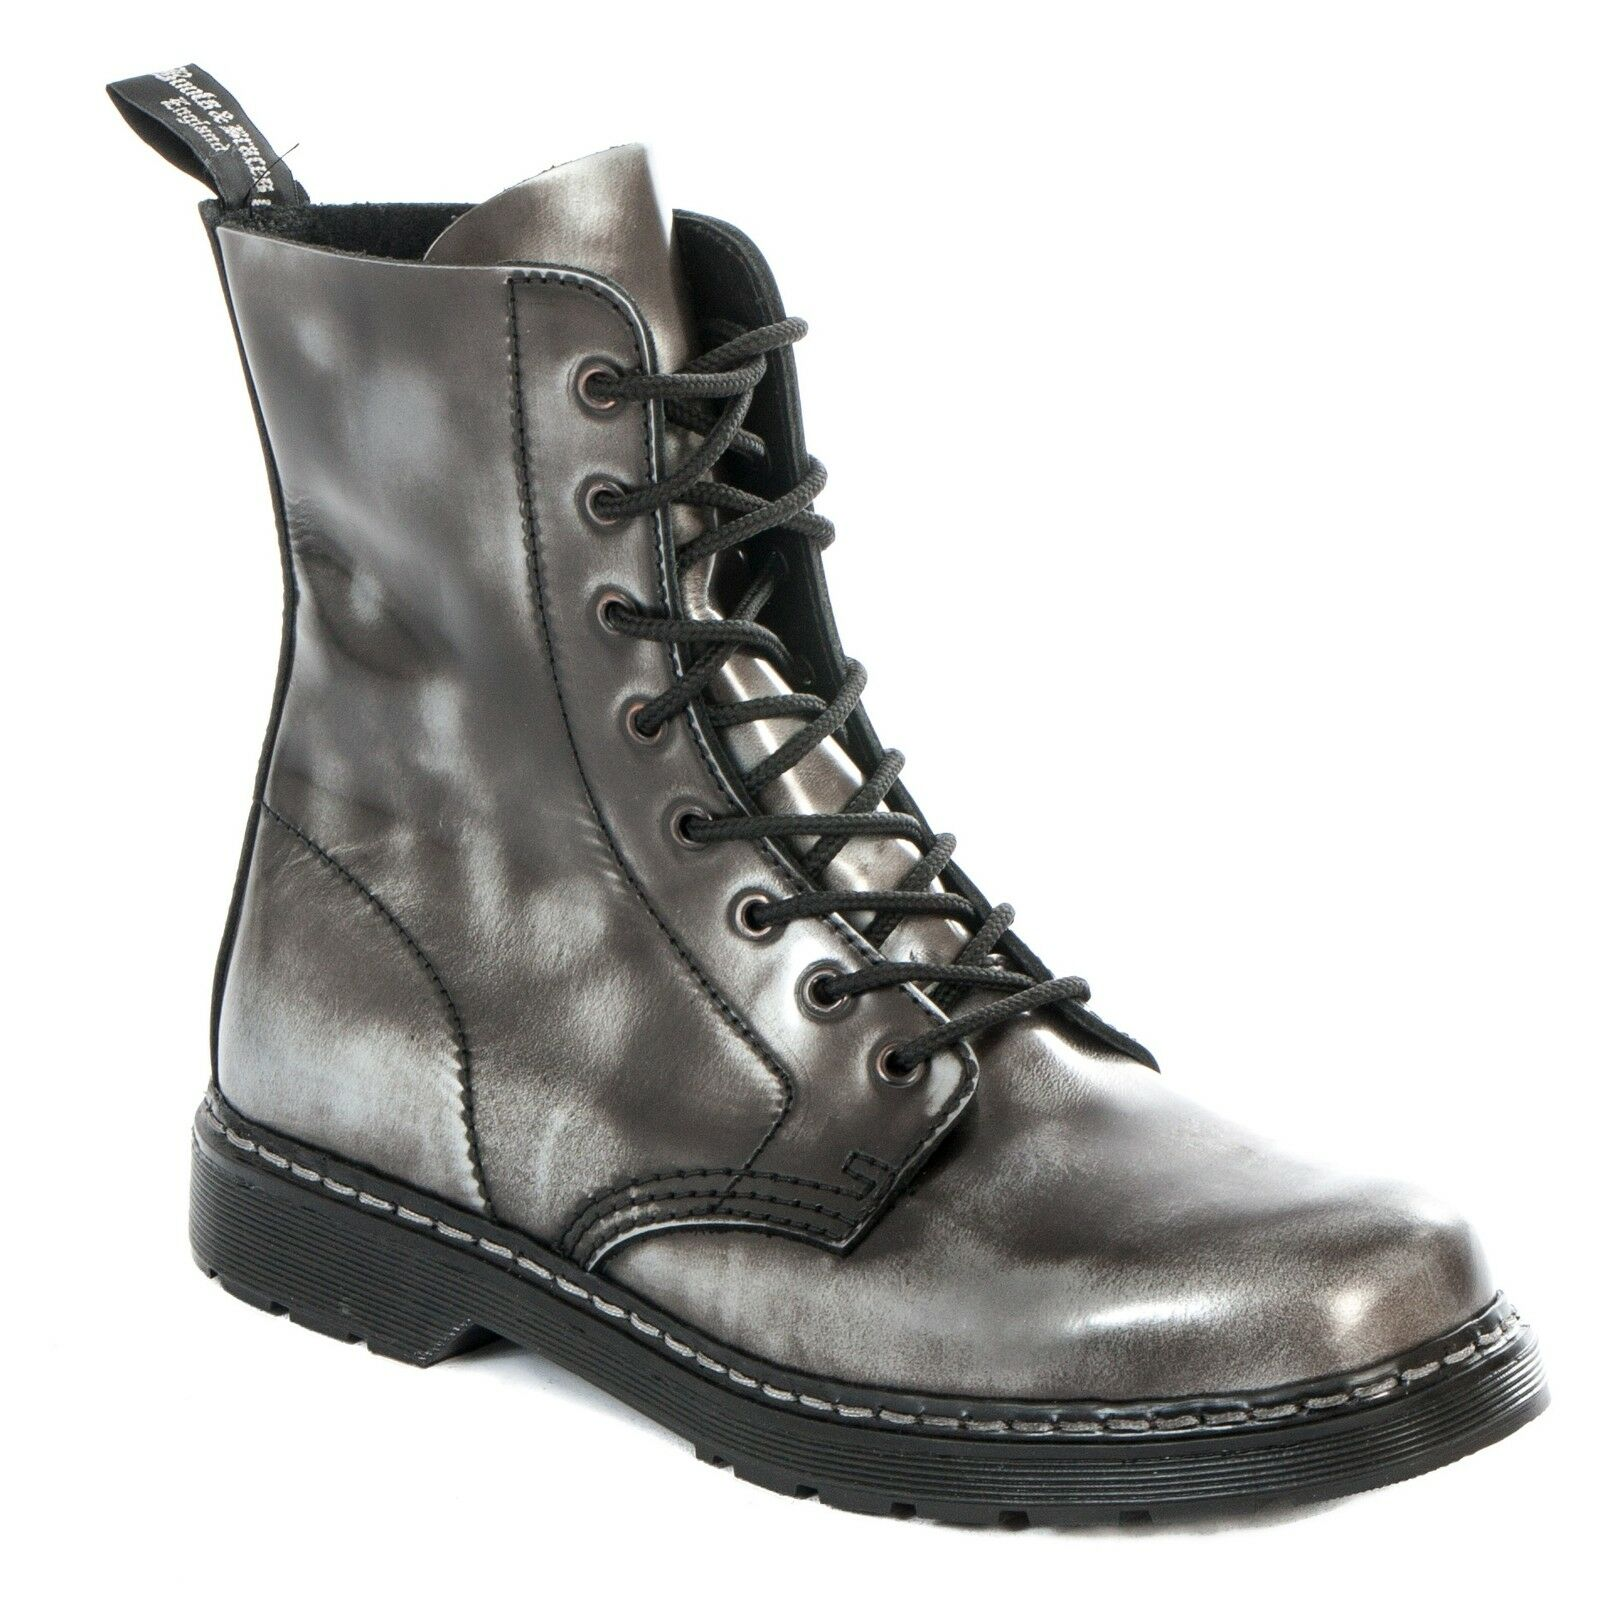 Boots & Braces - easy 8-Loch silver Schwarz Rub-off schwarz Stiefel Rangers Schwarz silver da28f3